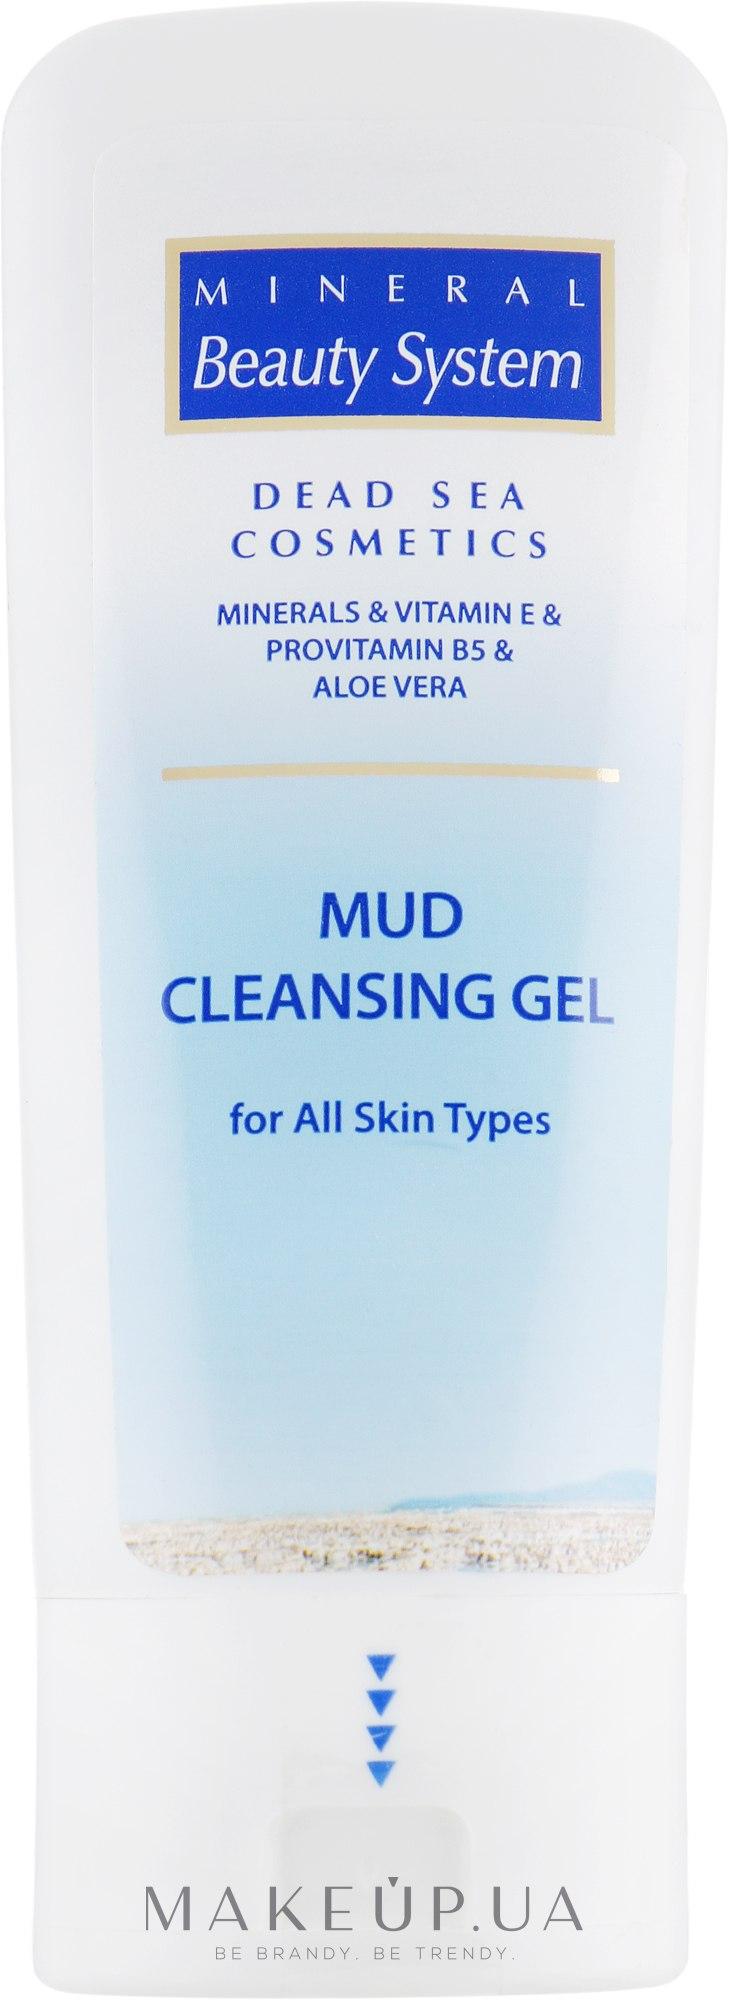 Грязевой очищающий гель - Mineral Beauty System Mud Cleansing Gel — фото 100ml